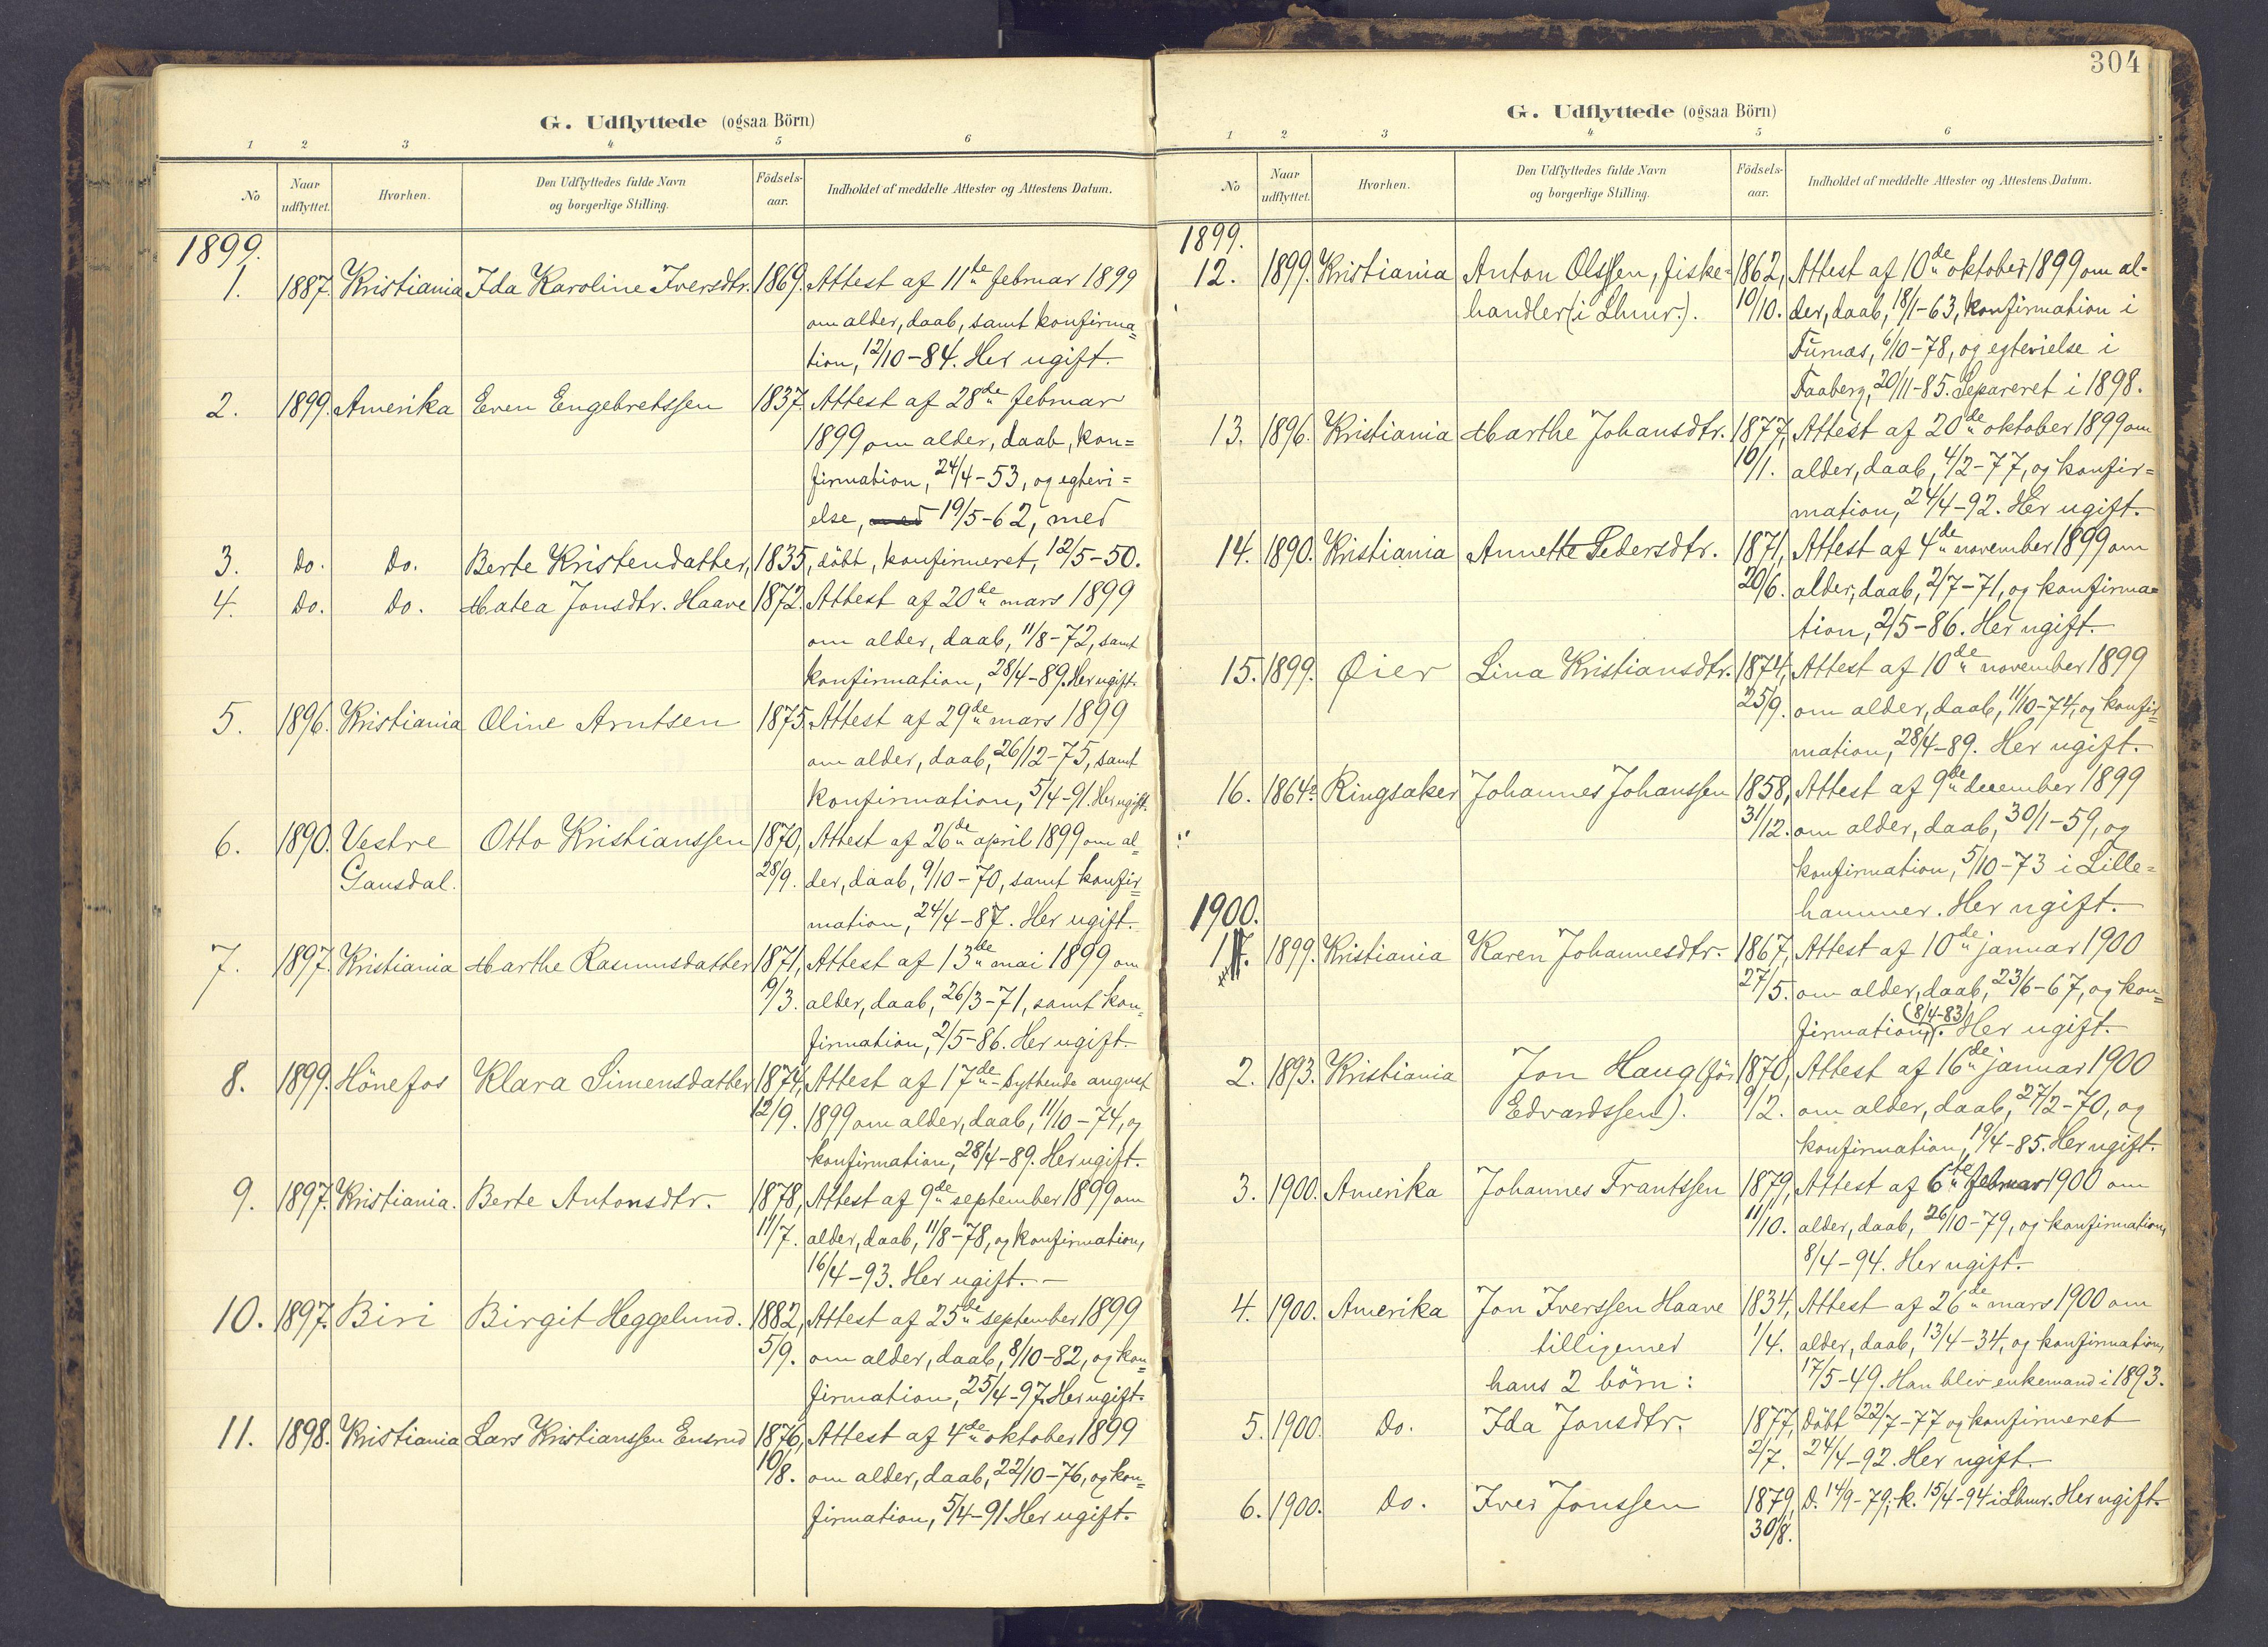 SAH, Fåberg prestekontor, Ministerialbok nr. 12, 1899-1915, s. 304